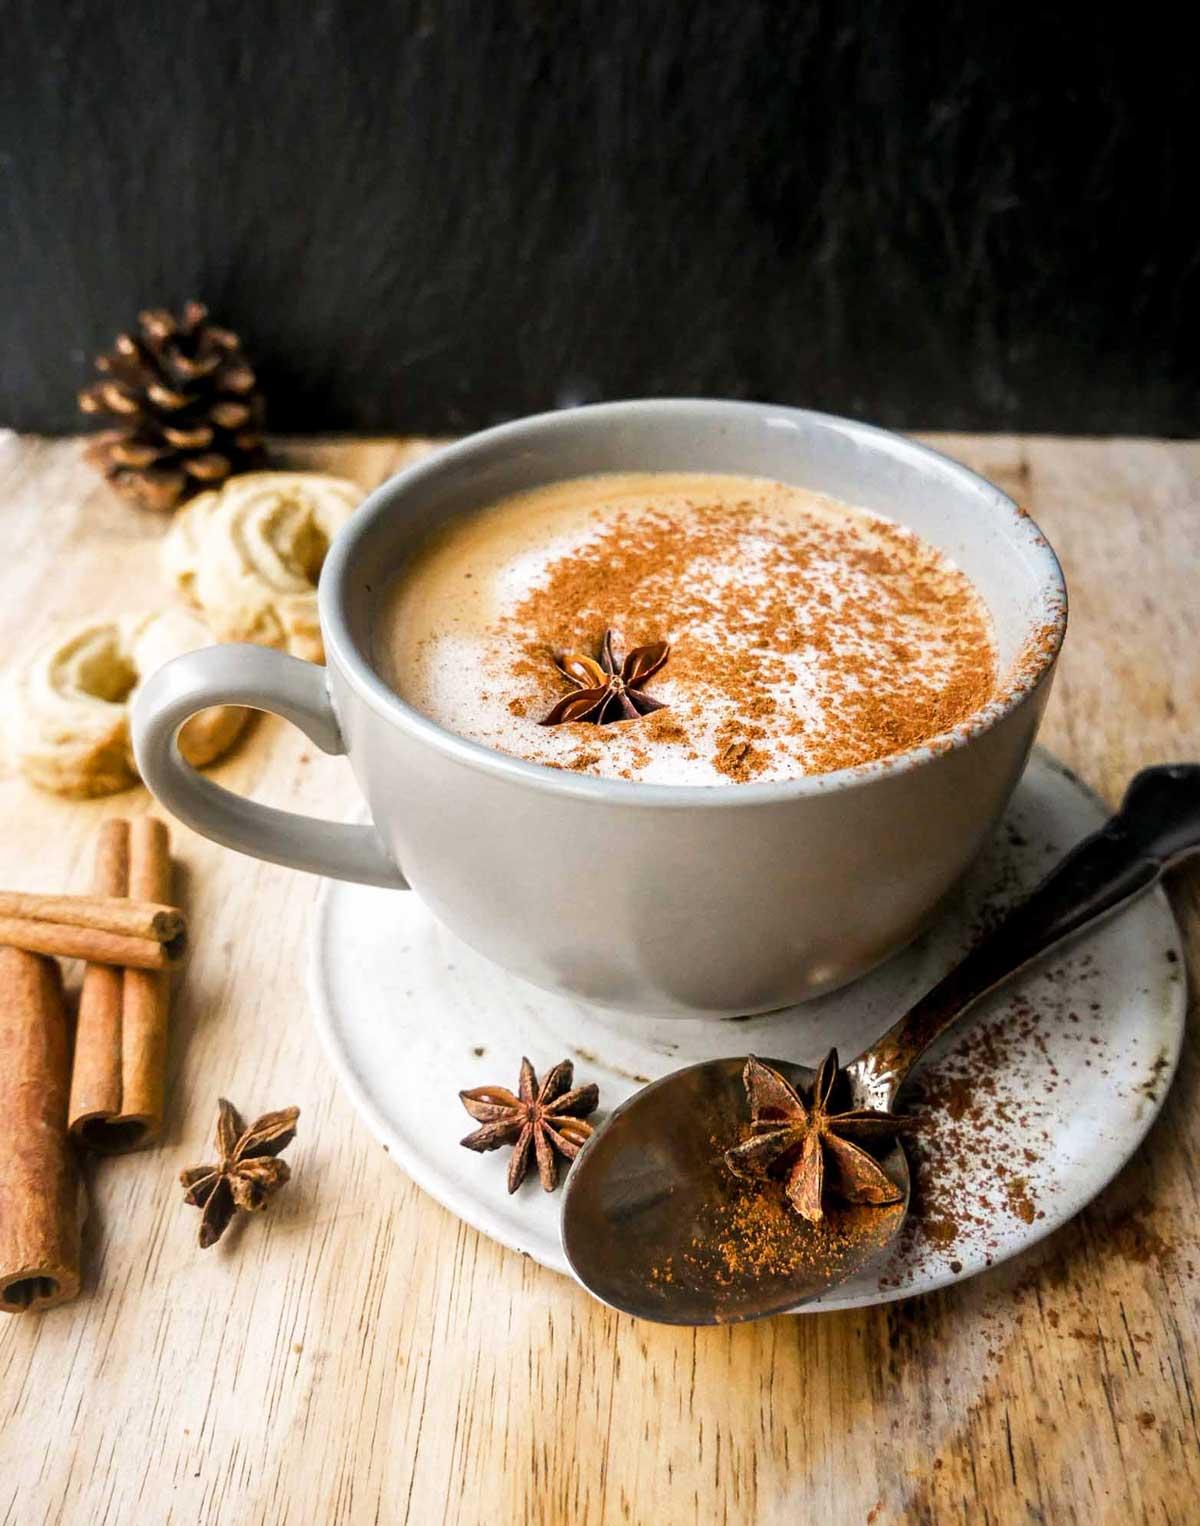 julekaffe vegansk kaffe med plantemælk